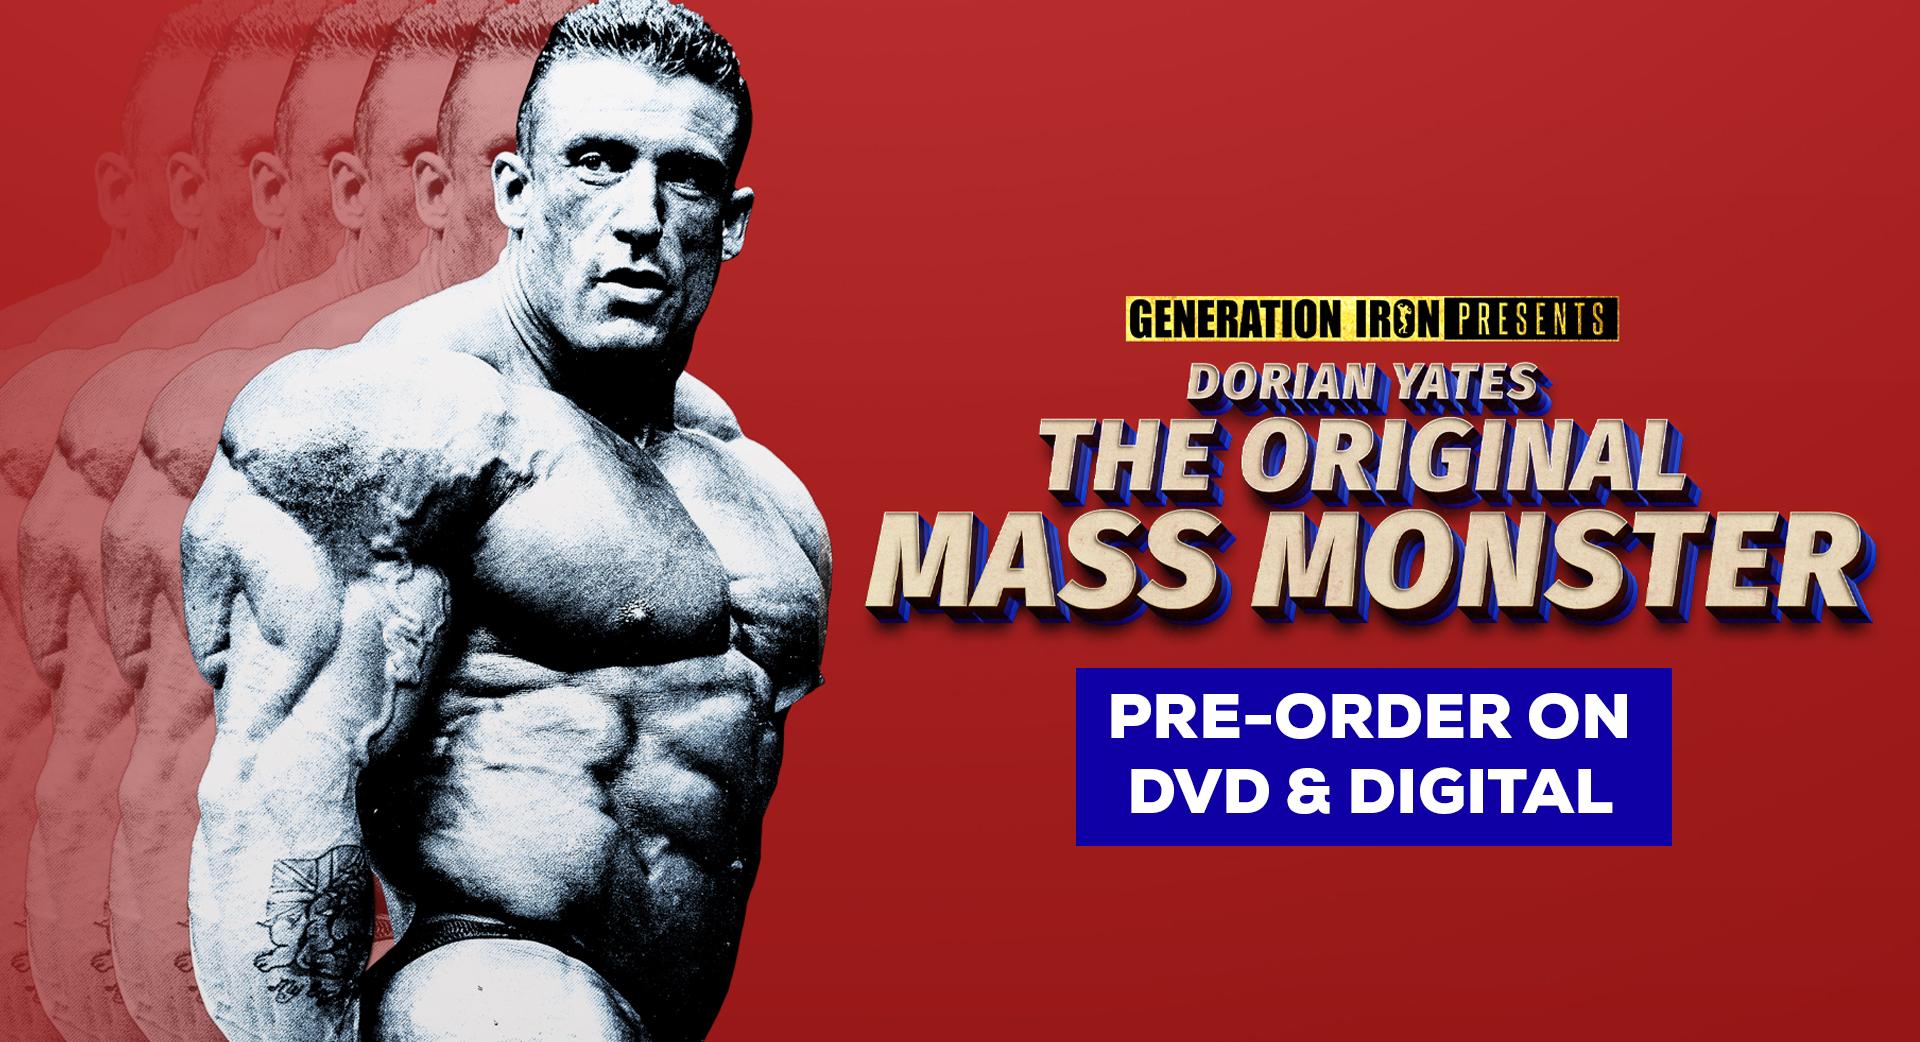 Dorian Yates The Original Mass Monster Pre-Order